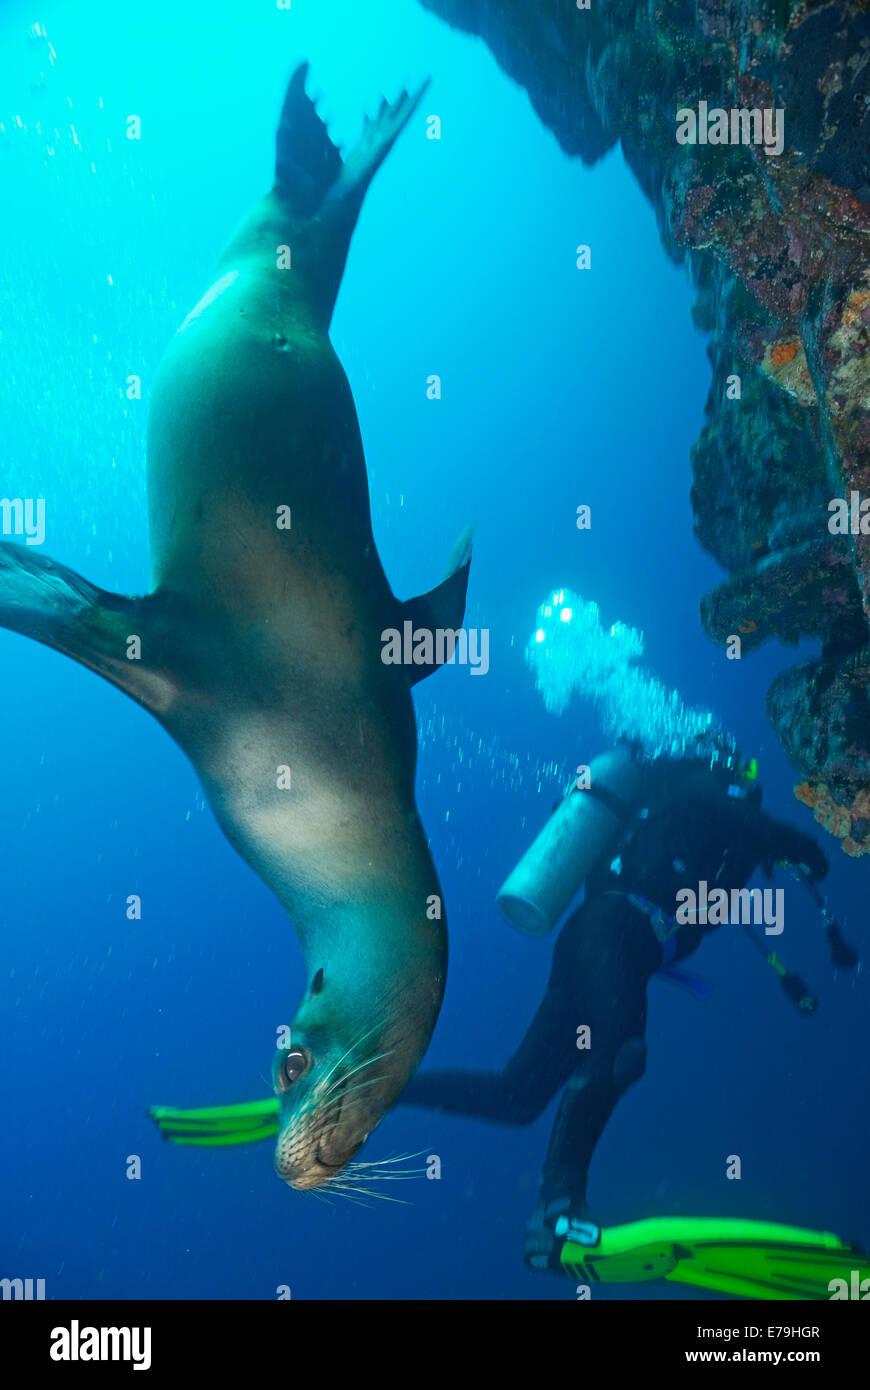 Scuba diving - Sea lion (Zalophus californianus) swimming by scuba diver, Galapagos archipelago, Wolf Island, Pacific - Stock Image